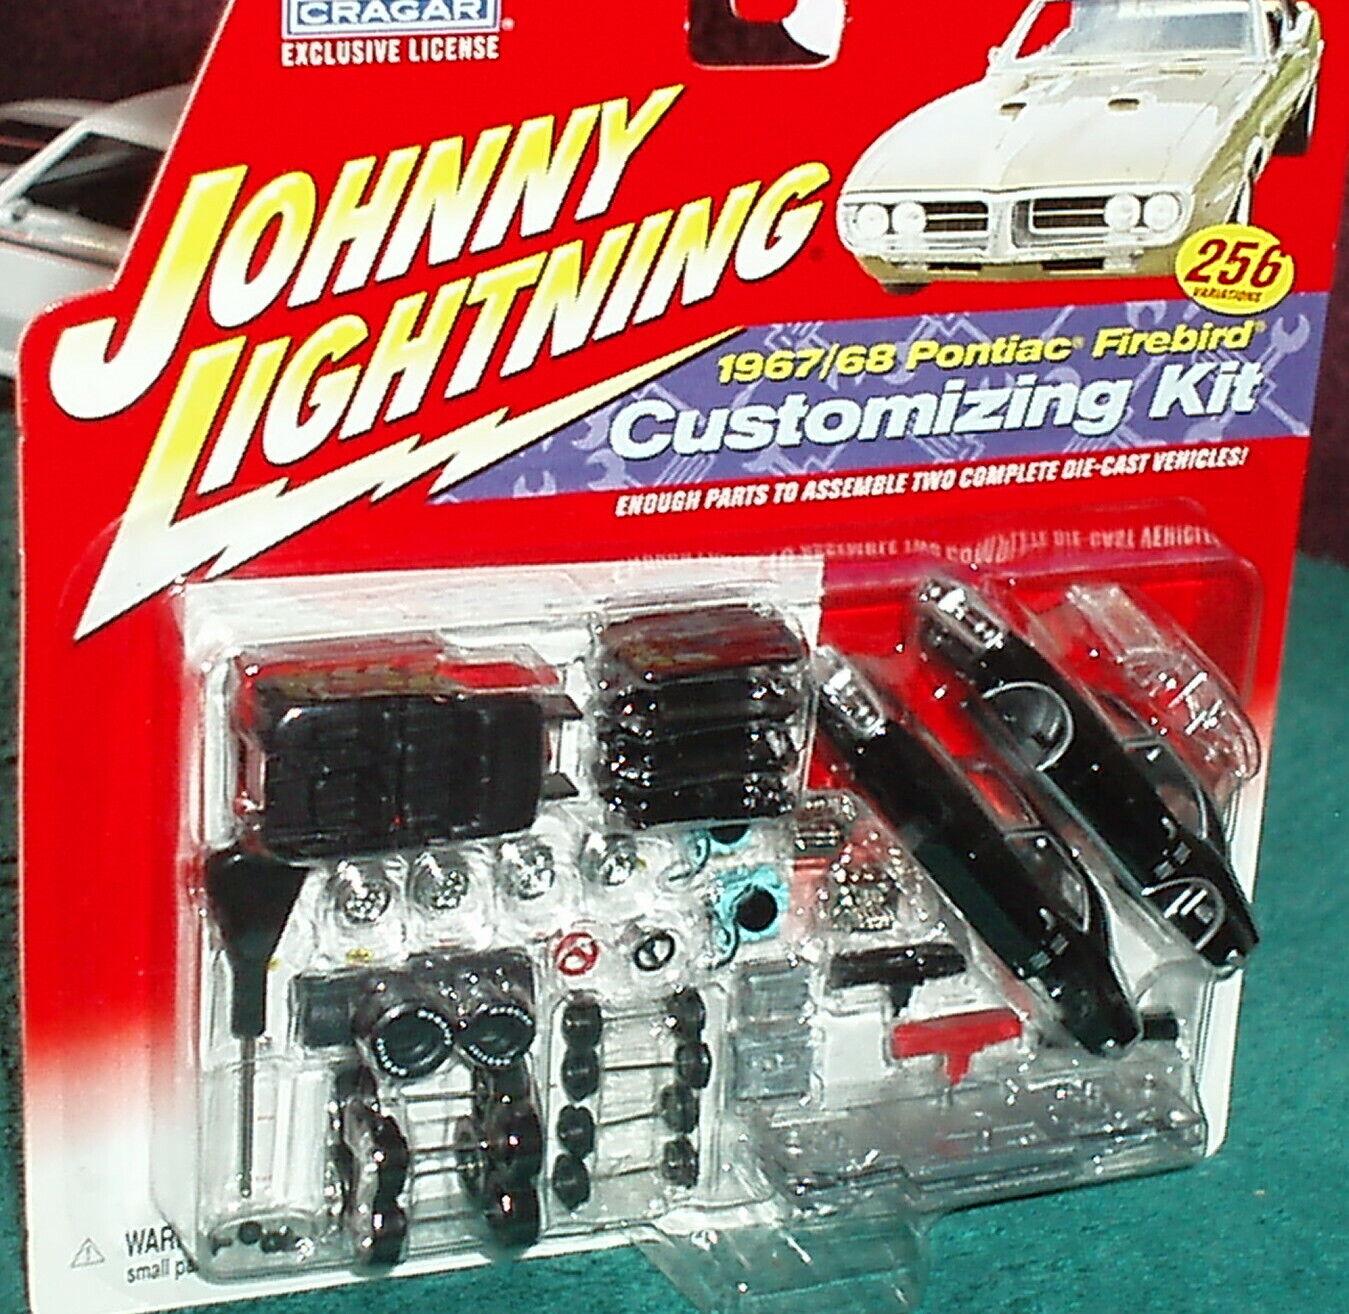 servicio de primera clase Johnny Lightning 1967 1968 Pontiac Firebird 2 2 2 en 1 Modelo Kit Set Negro  mejor marca